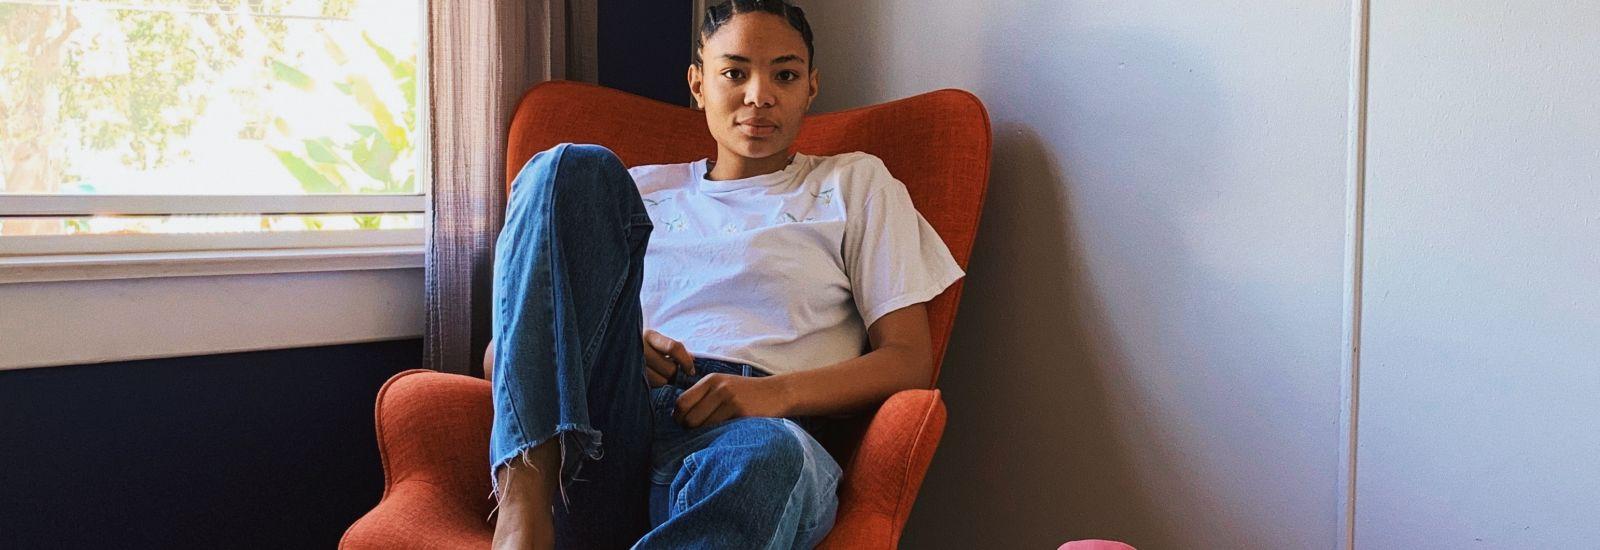 person sitting on chair. Credits: Monique Rangell-Onwuegbuzia via Unsplash